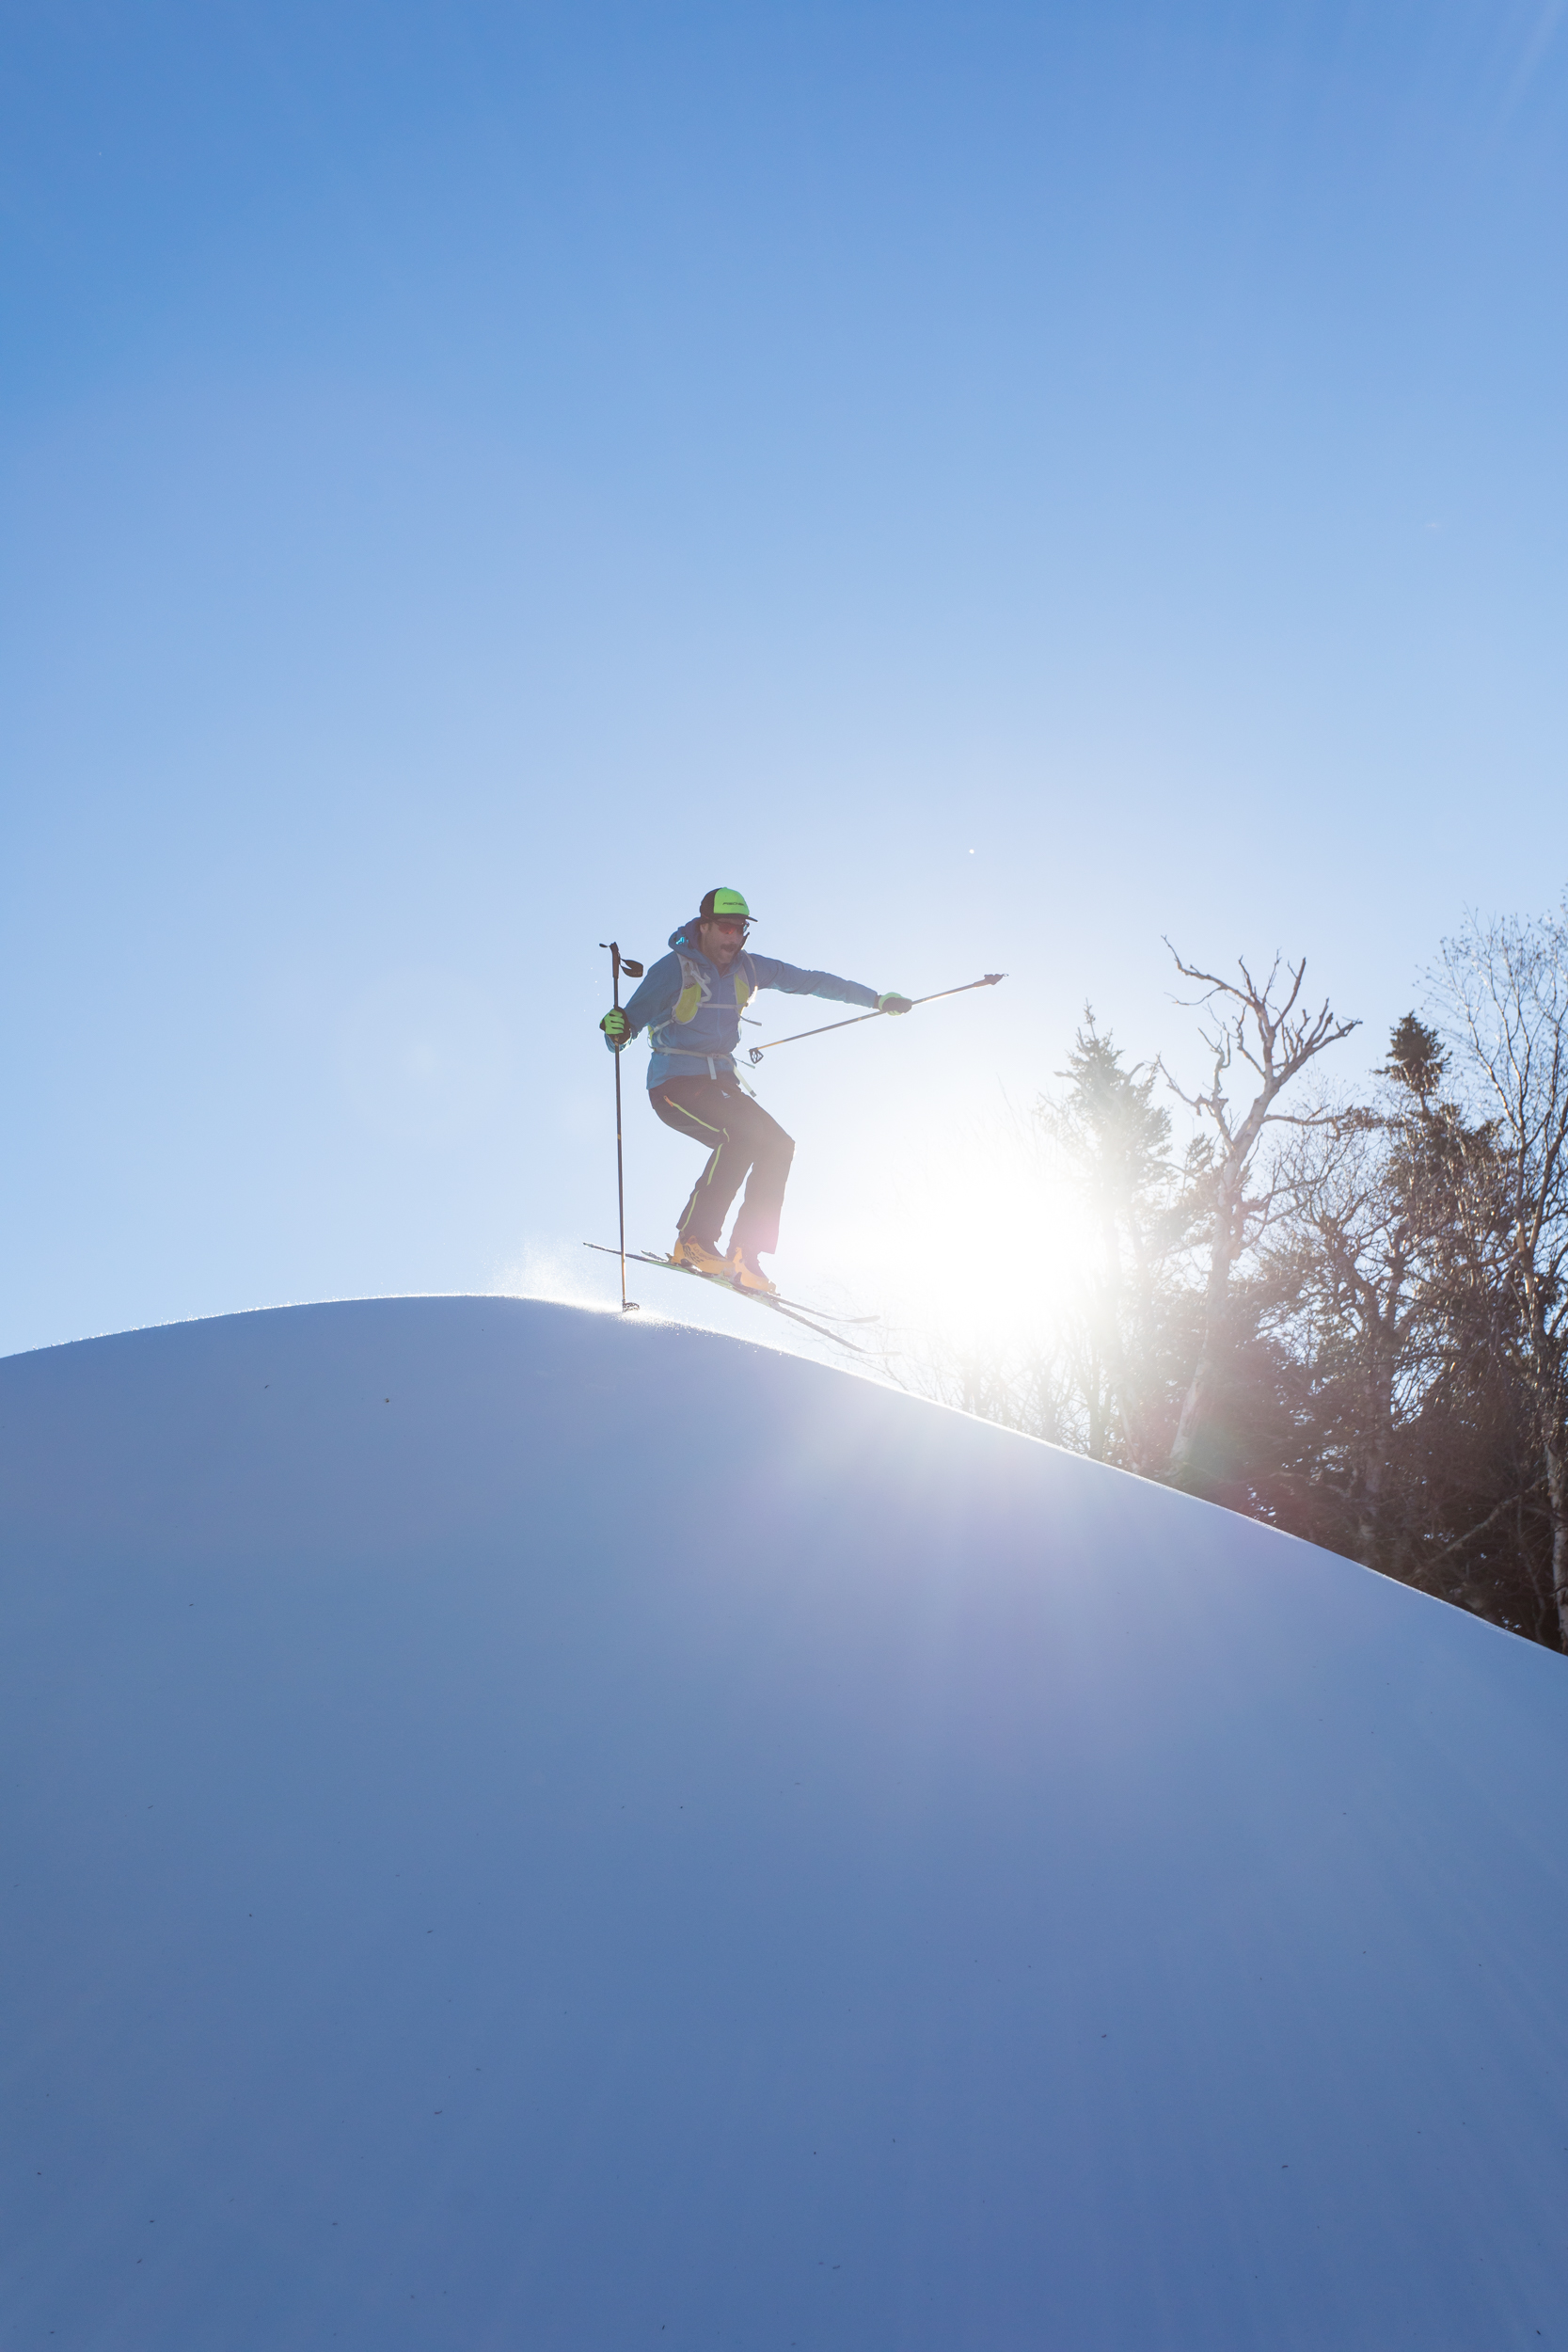 andrew drummond alpattack race skis.jpg